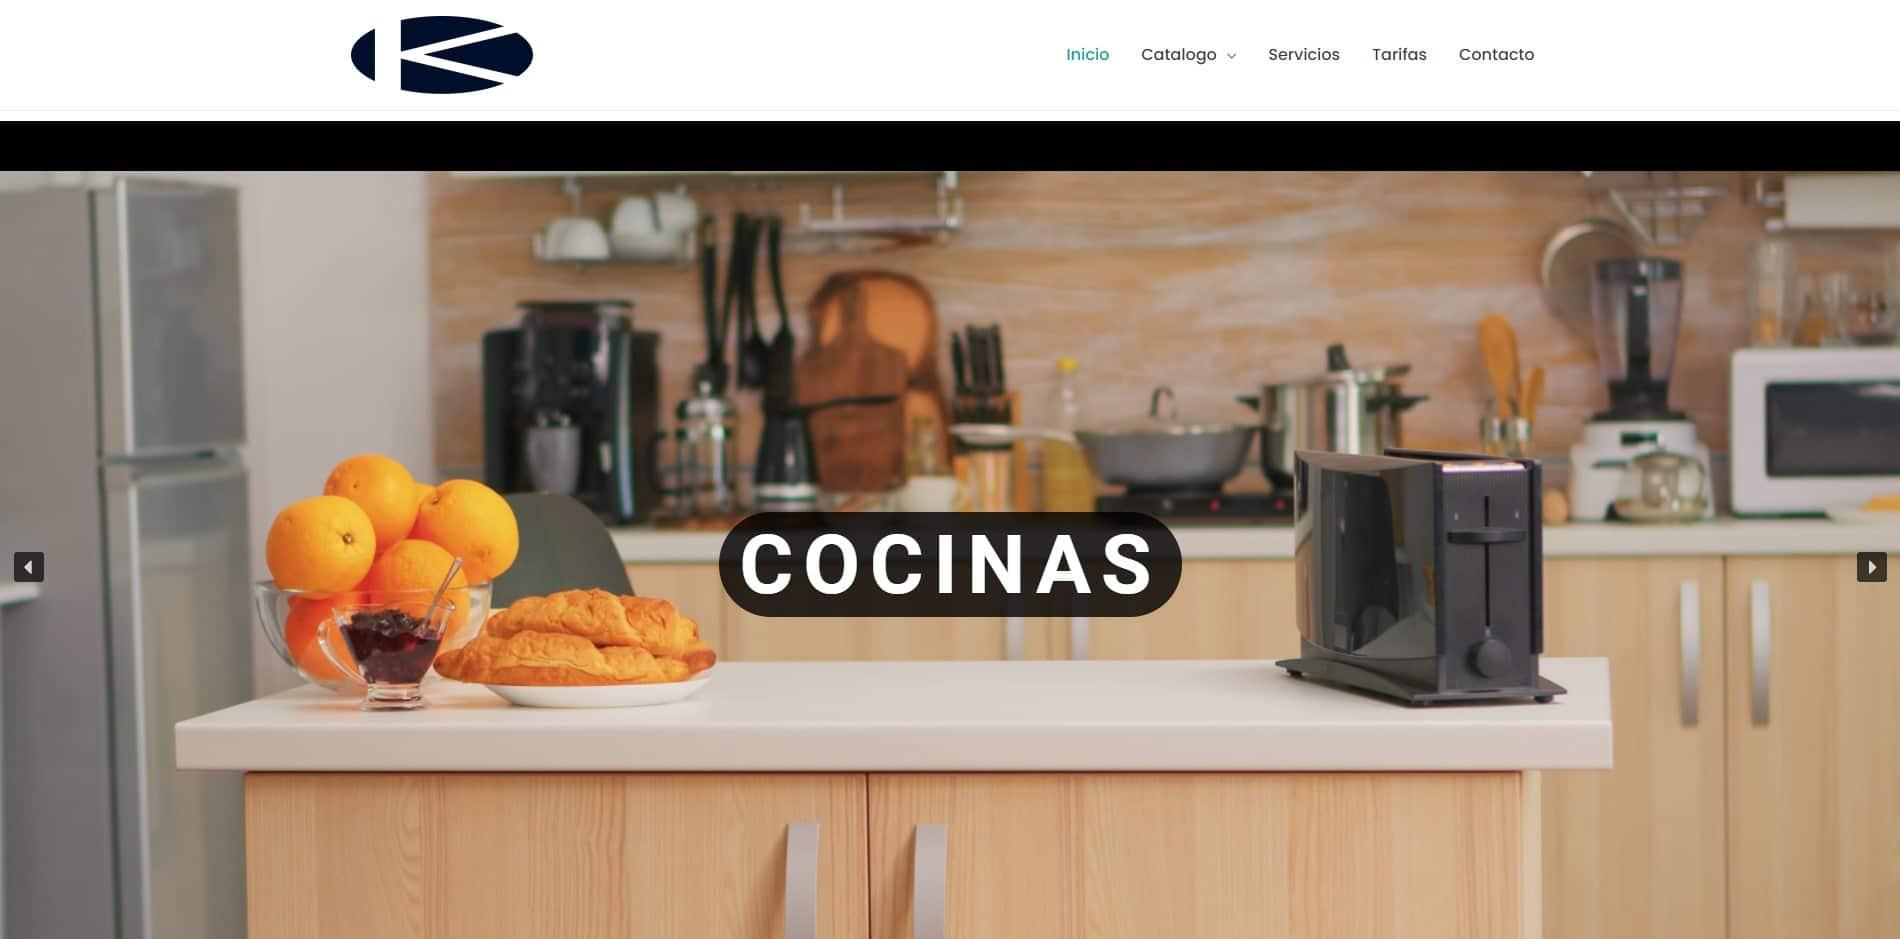 Diseño Web en WordPress Personalizado Kitcosur